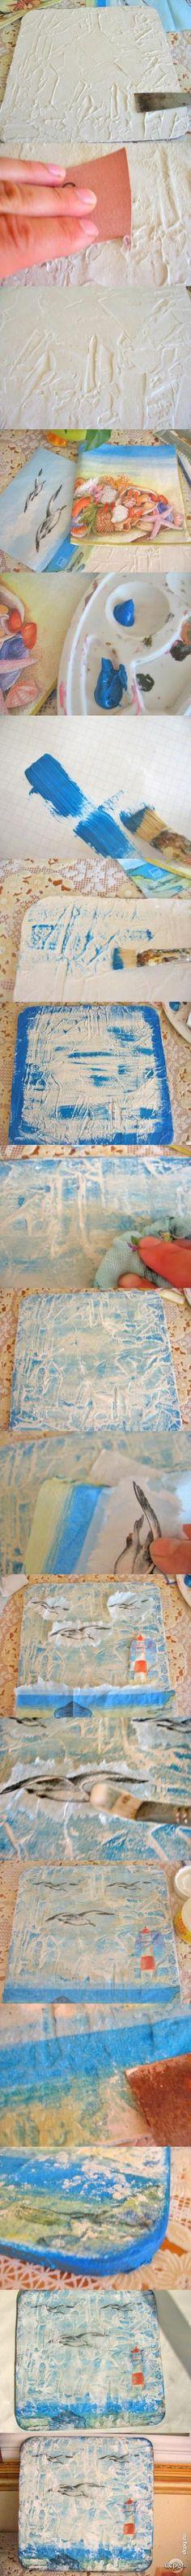 Декупаж - Сайт любителей декупажа - DCPG.RU   Декупаж по шпатлевке Click on photo to see more! Нажмите на фото чтобы увидеть больше!  decoupage art craft handmade home decor DIY do it yourself tutorial